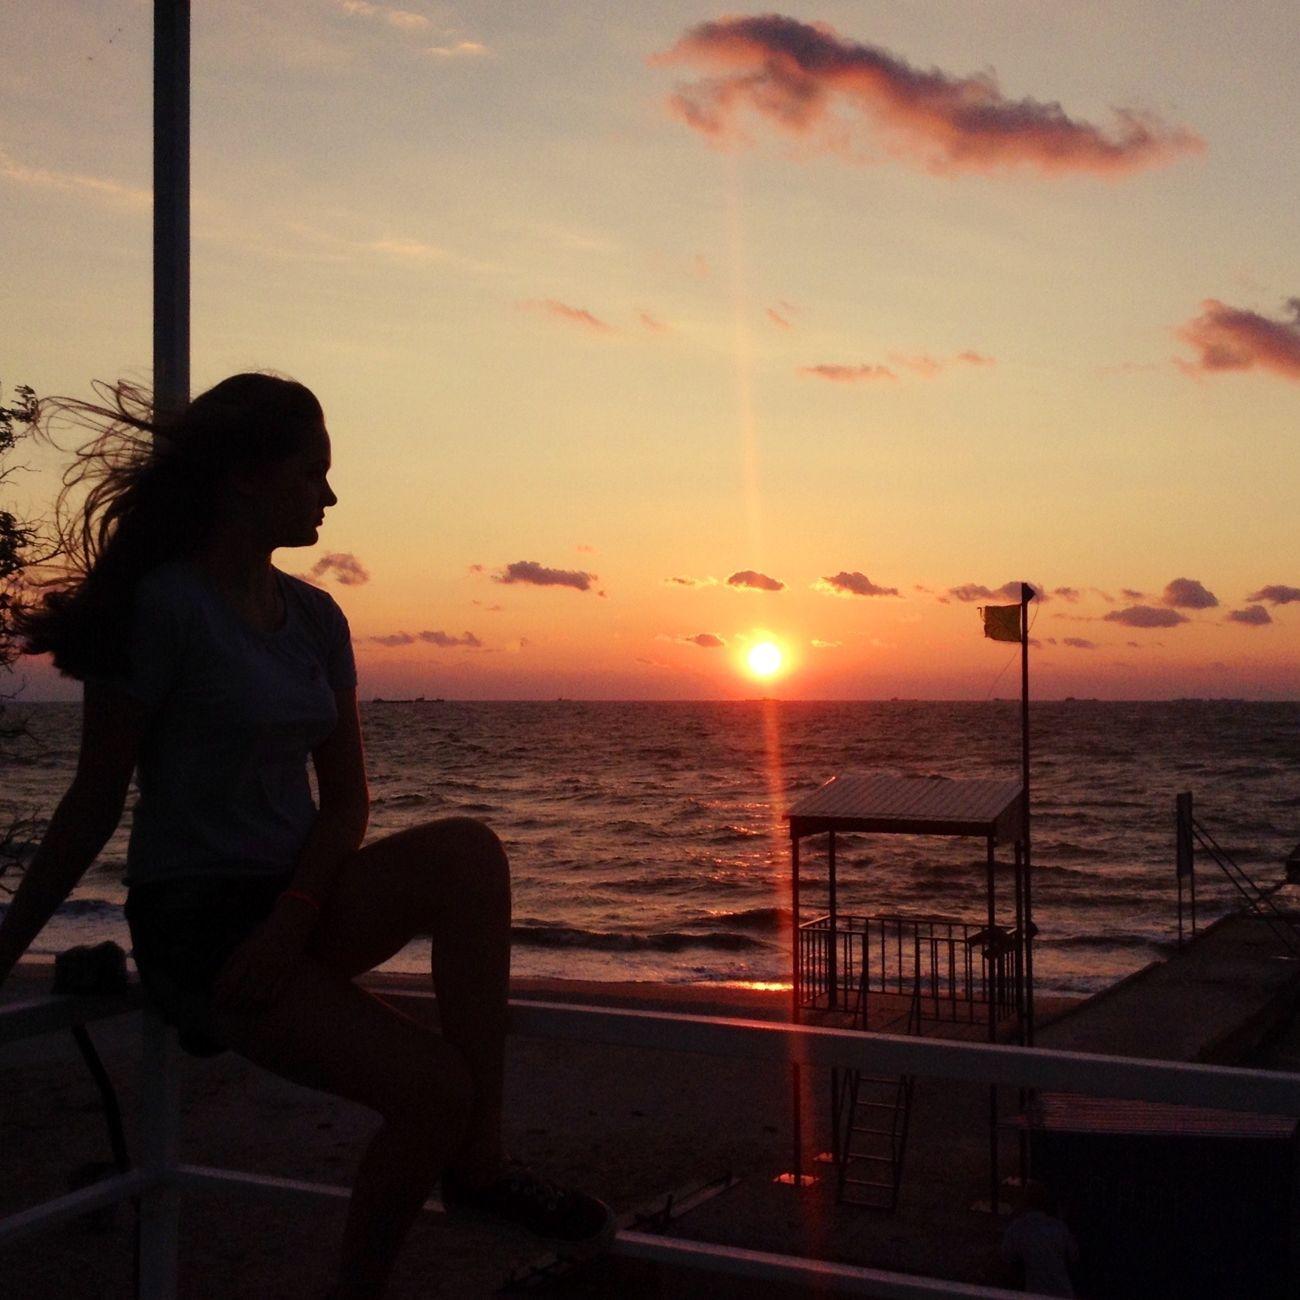 Just Good Evening Beautiful Photo Good Times Photo Art Sunset Photography